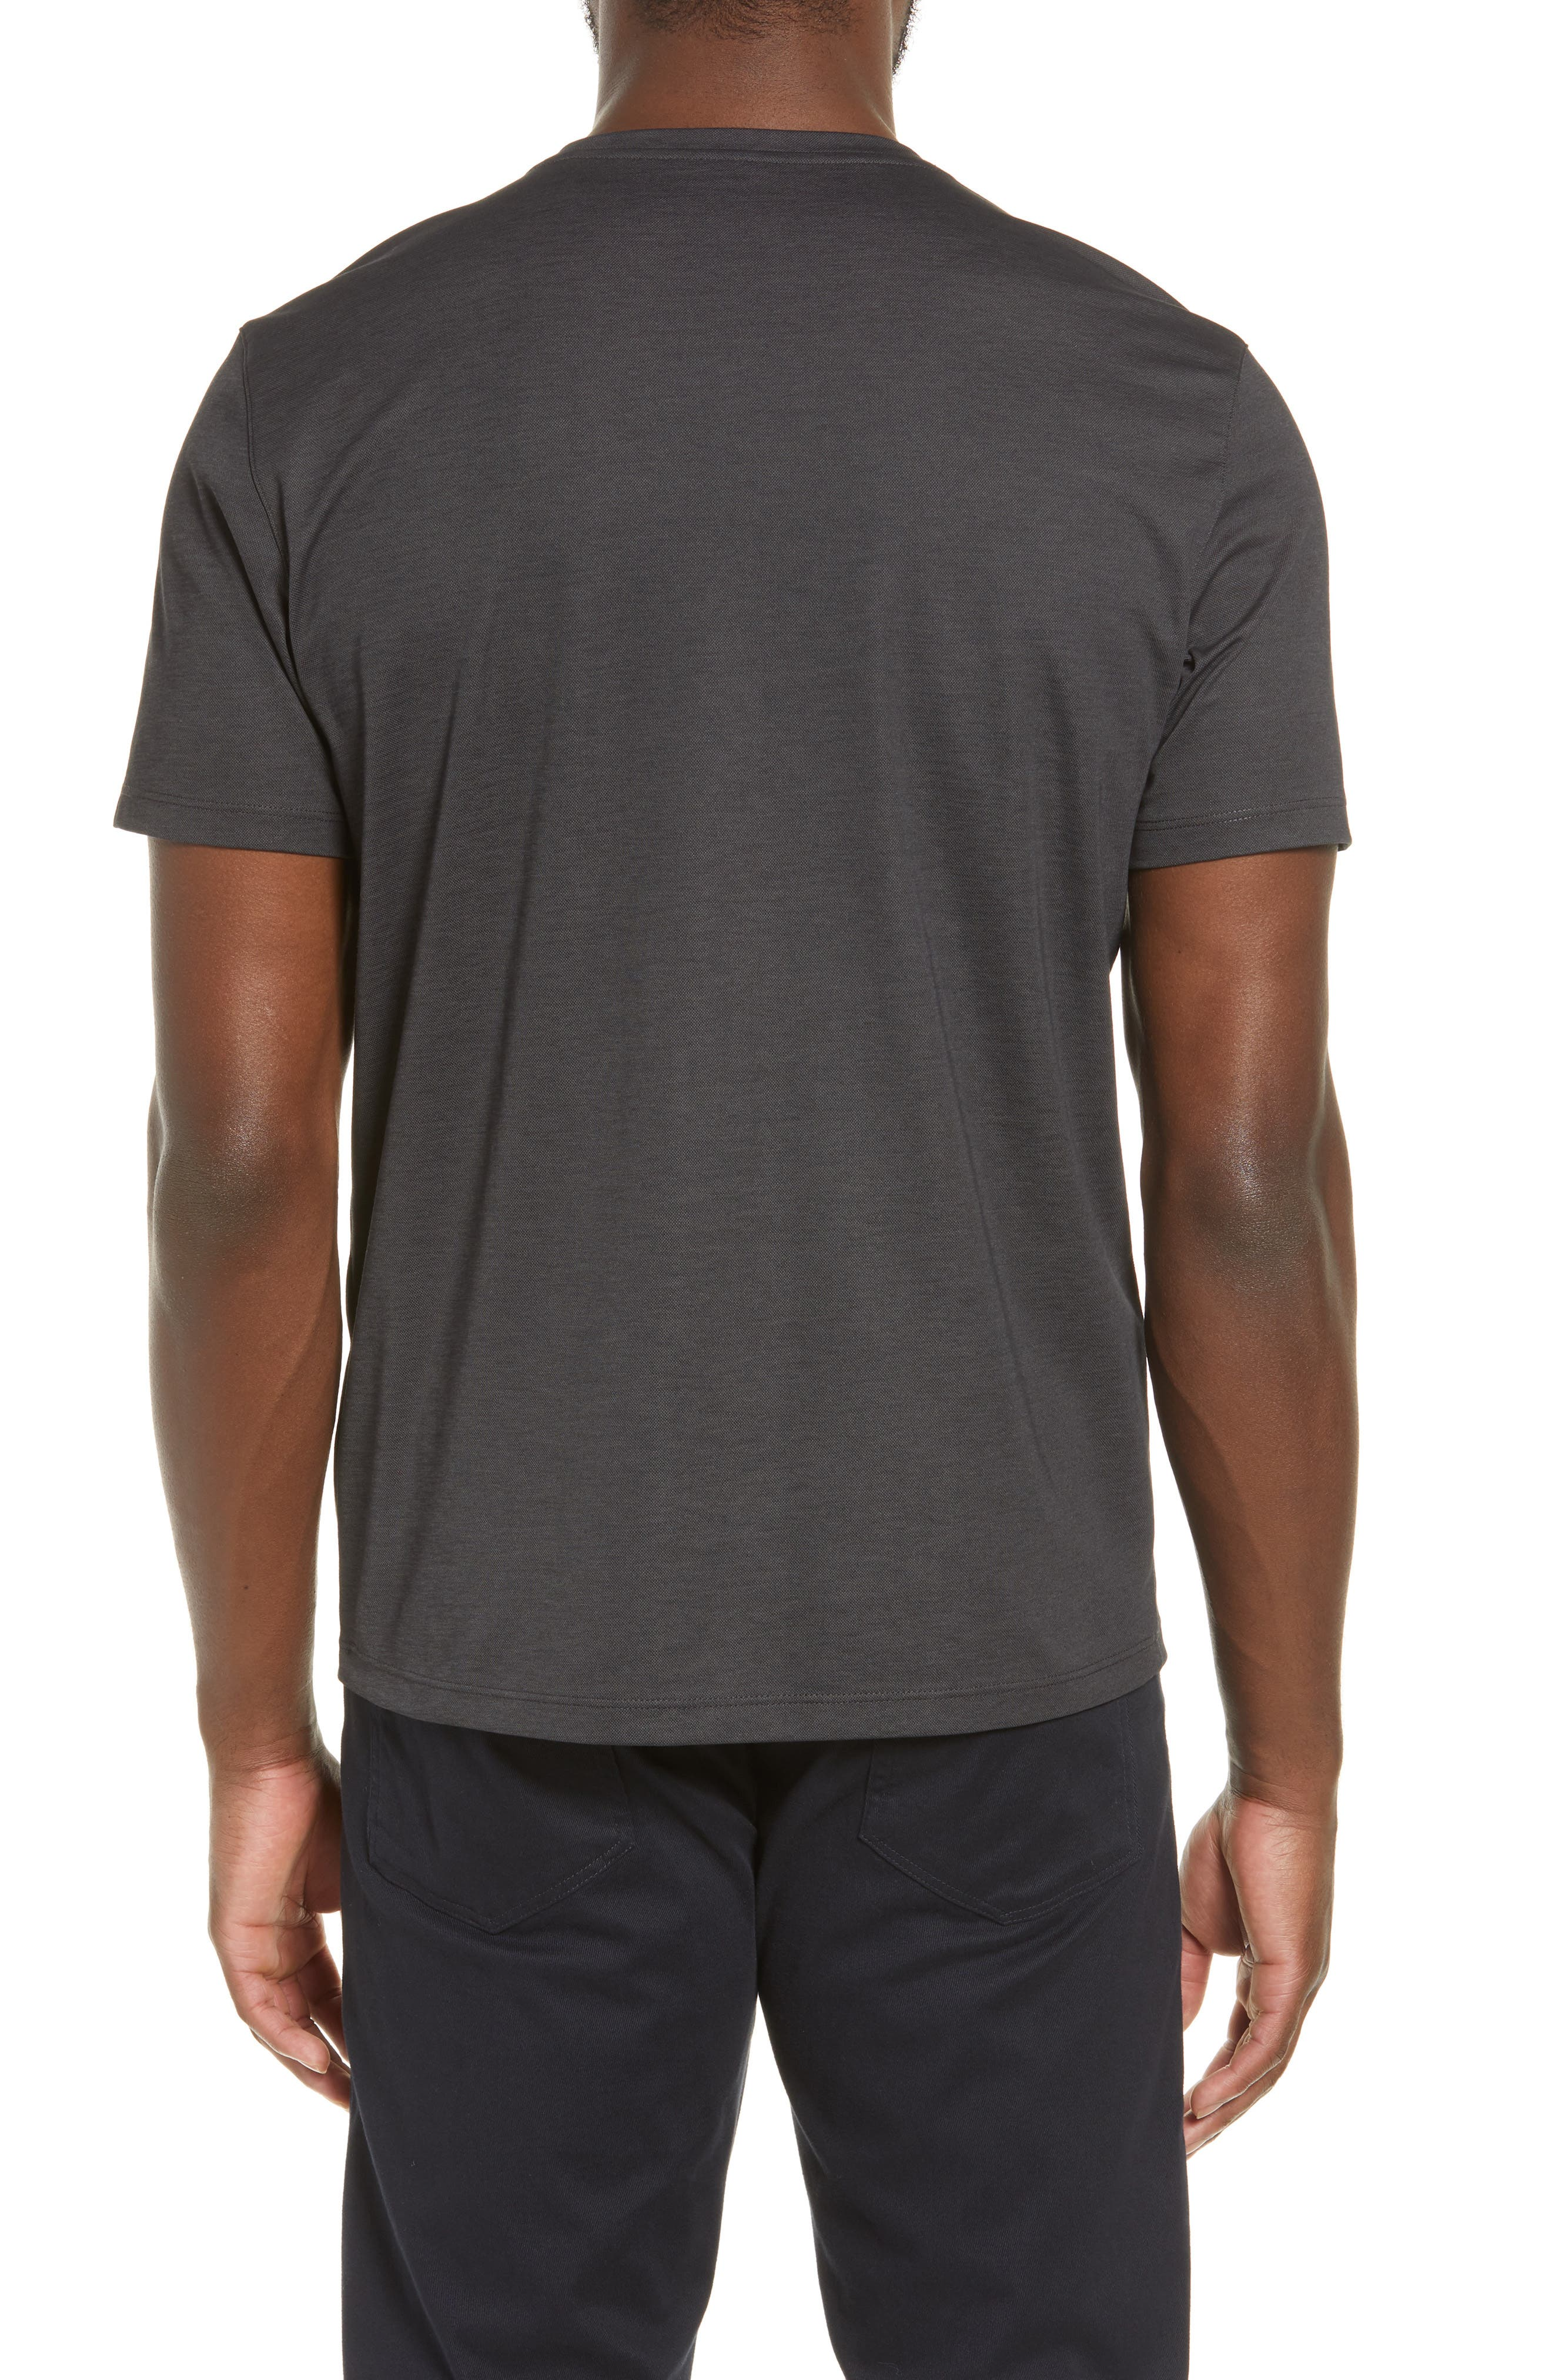 ZACHARY PRELL, Brookville Regular Fit Piqué T-Shirt, Alternate thumbnail 2, color, BLACK